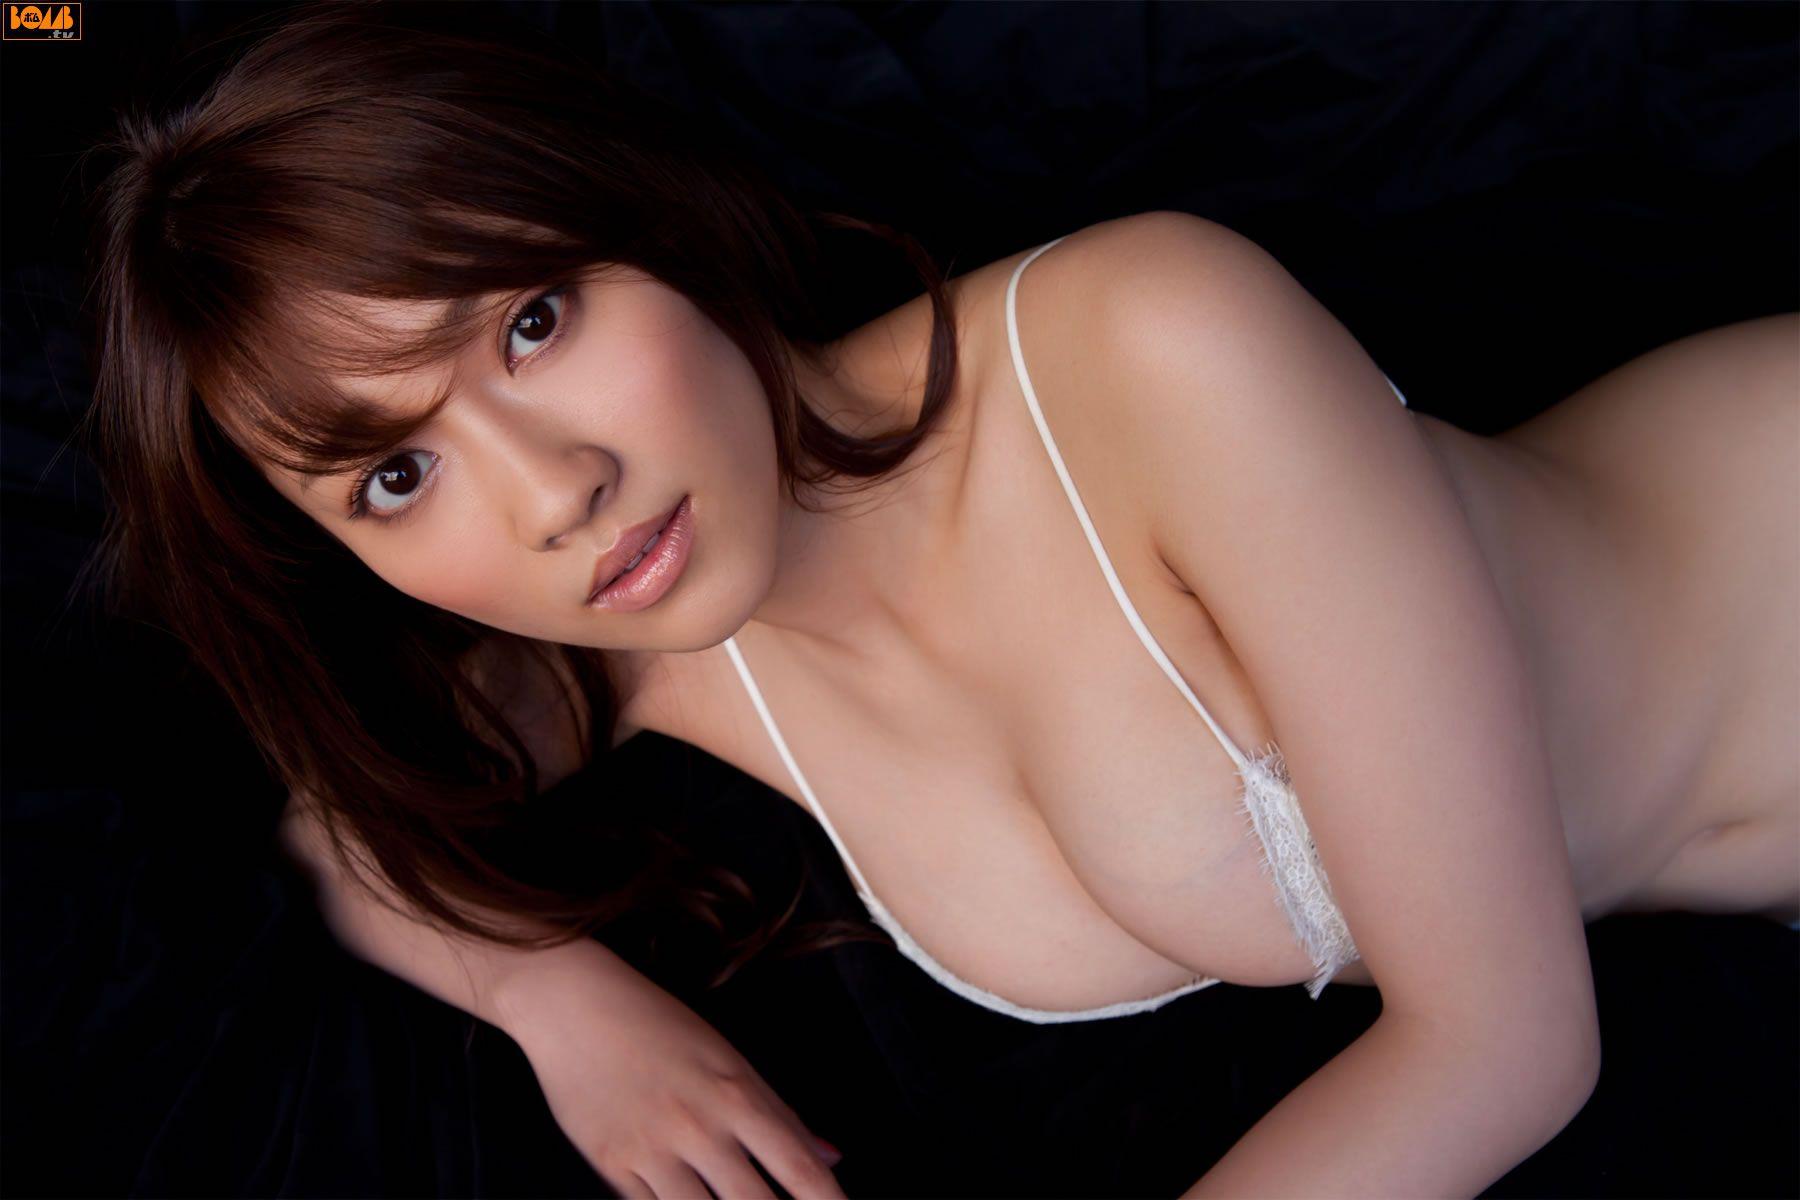 Bomb Tv 日韩美图2013 06 Mikie Hara 原幹恵 55p 高清图集 Dep